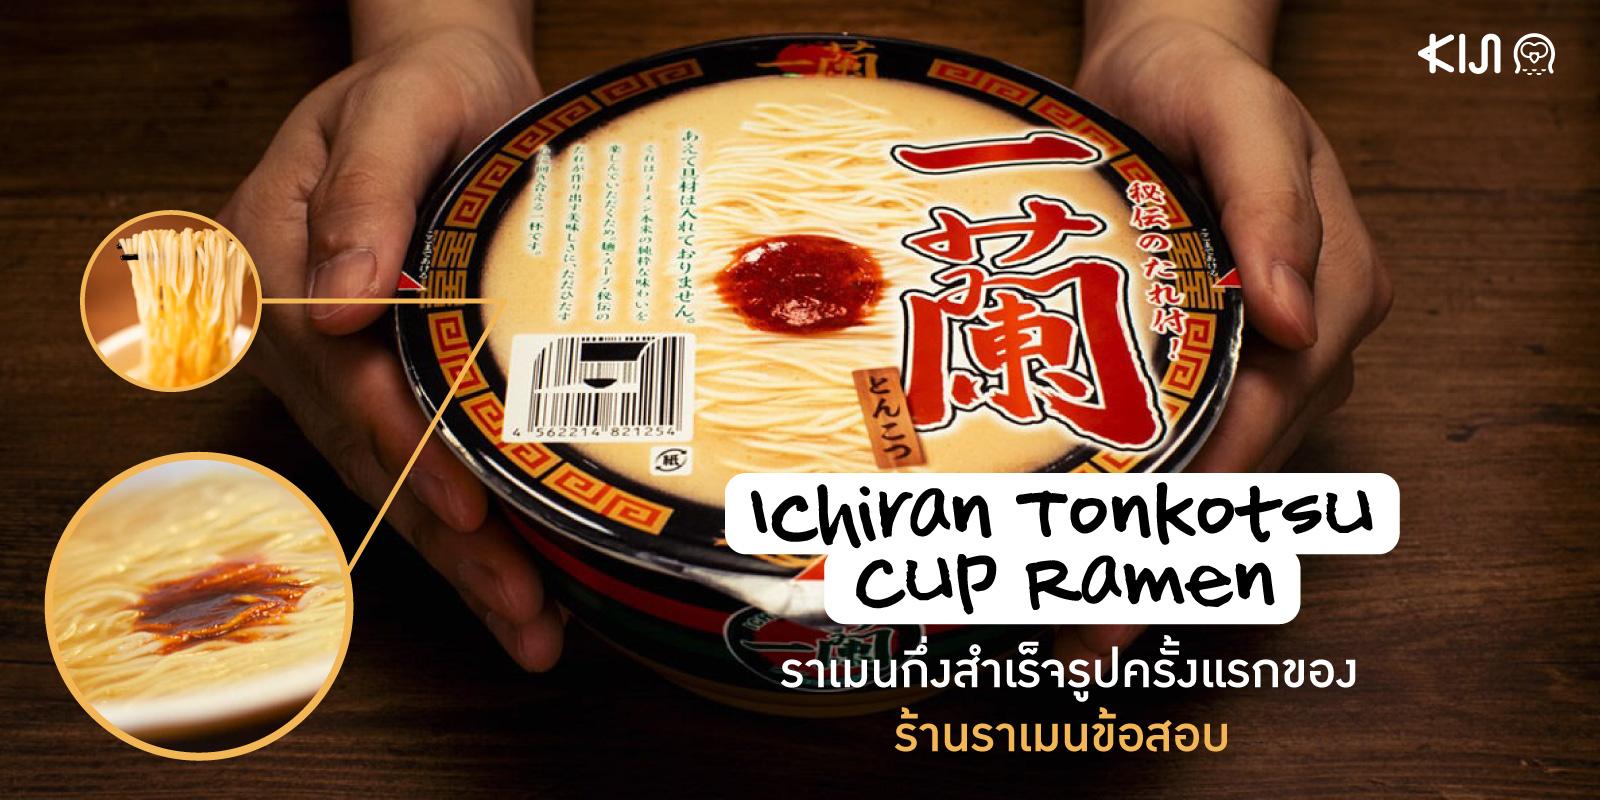 Ichiran Tonkotsu Cup Ramen วางจำหน่ายตั้งแต่วันที่ 15 กุมภาพันธ์ที่ผ่านมา